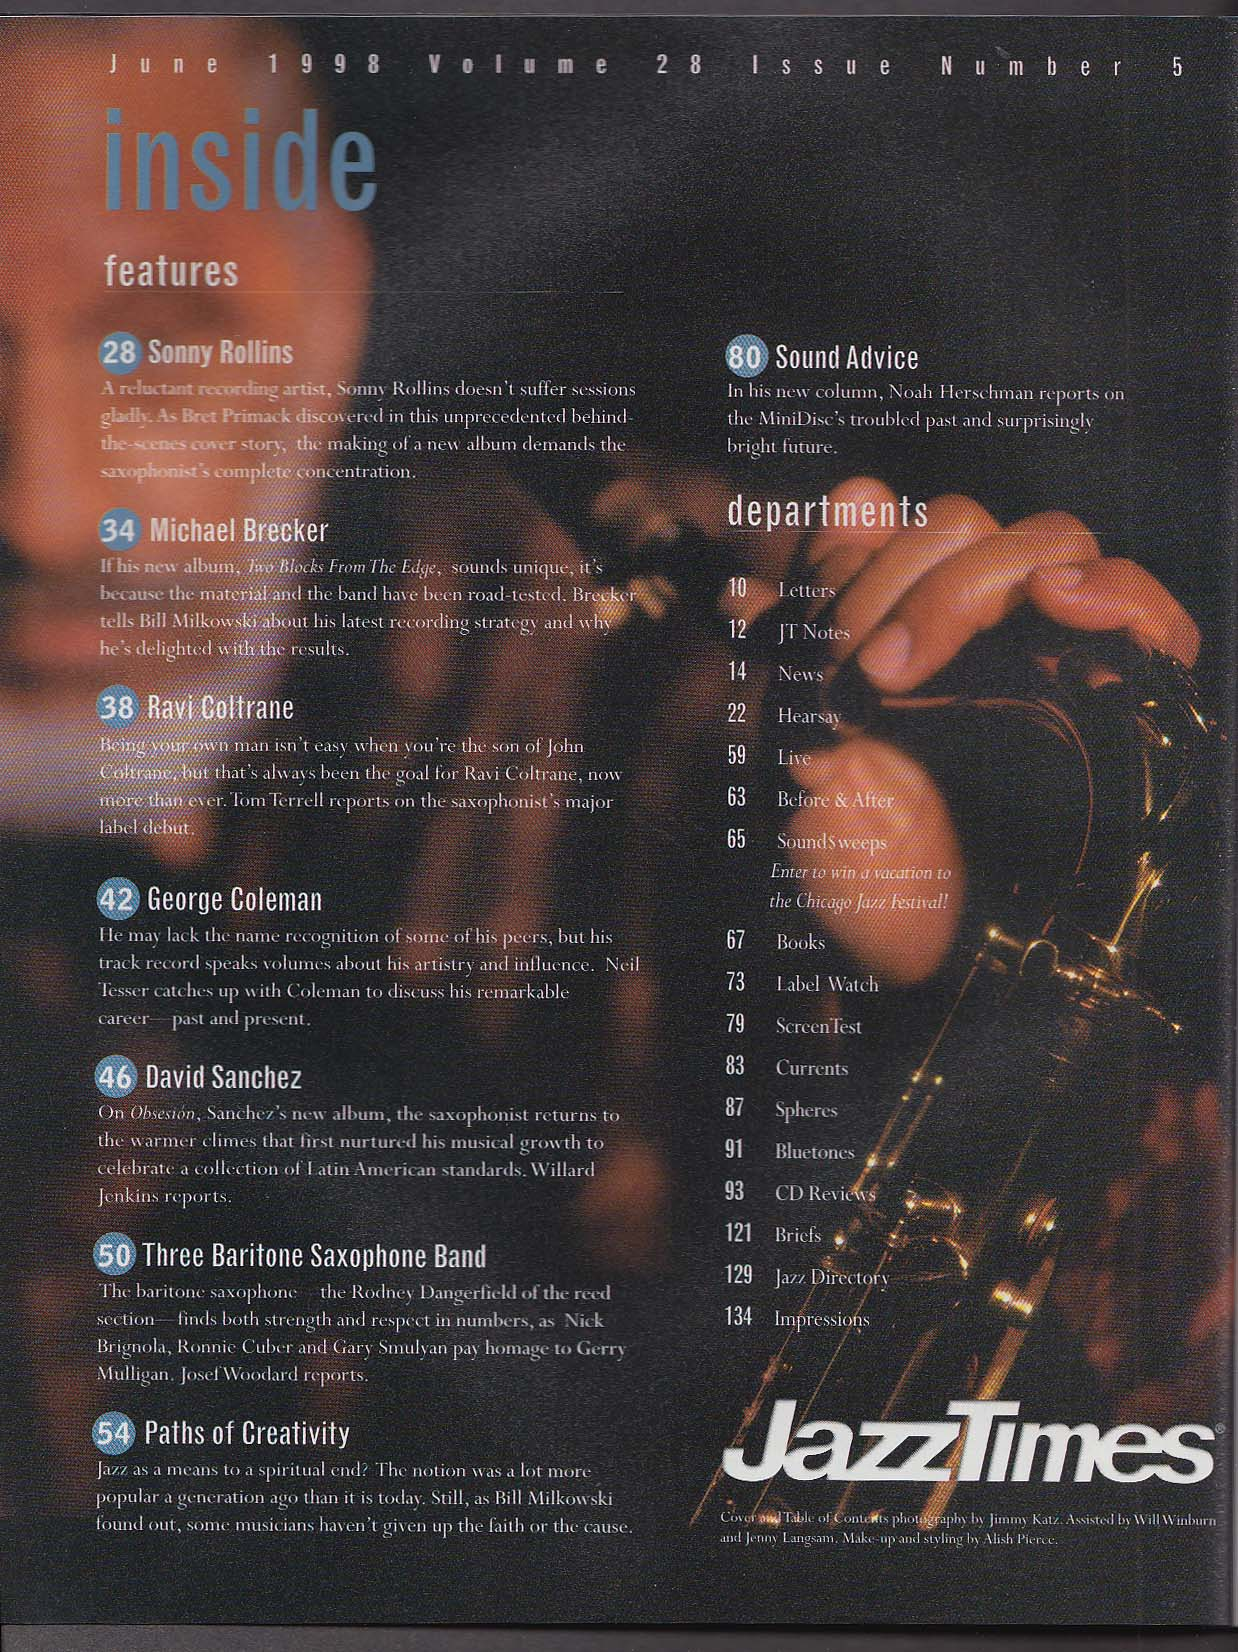 JAZZ TIMES Sonny Rollins George Coleman Ravi Coltrane David Sanchez 6 1998